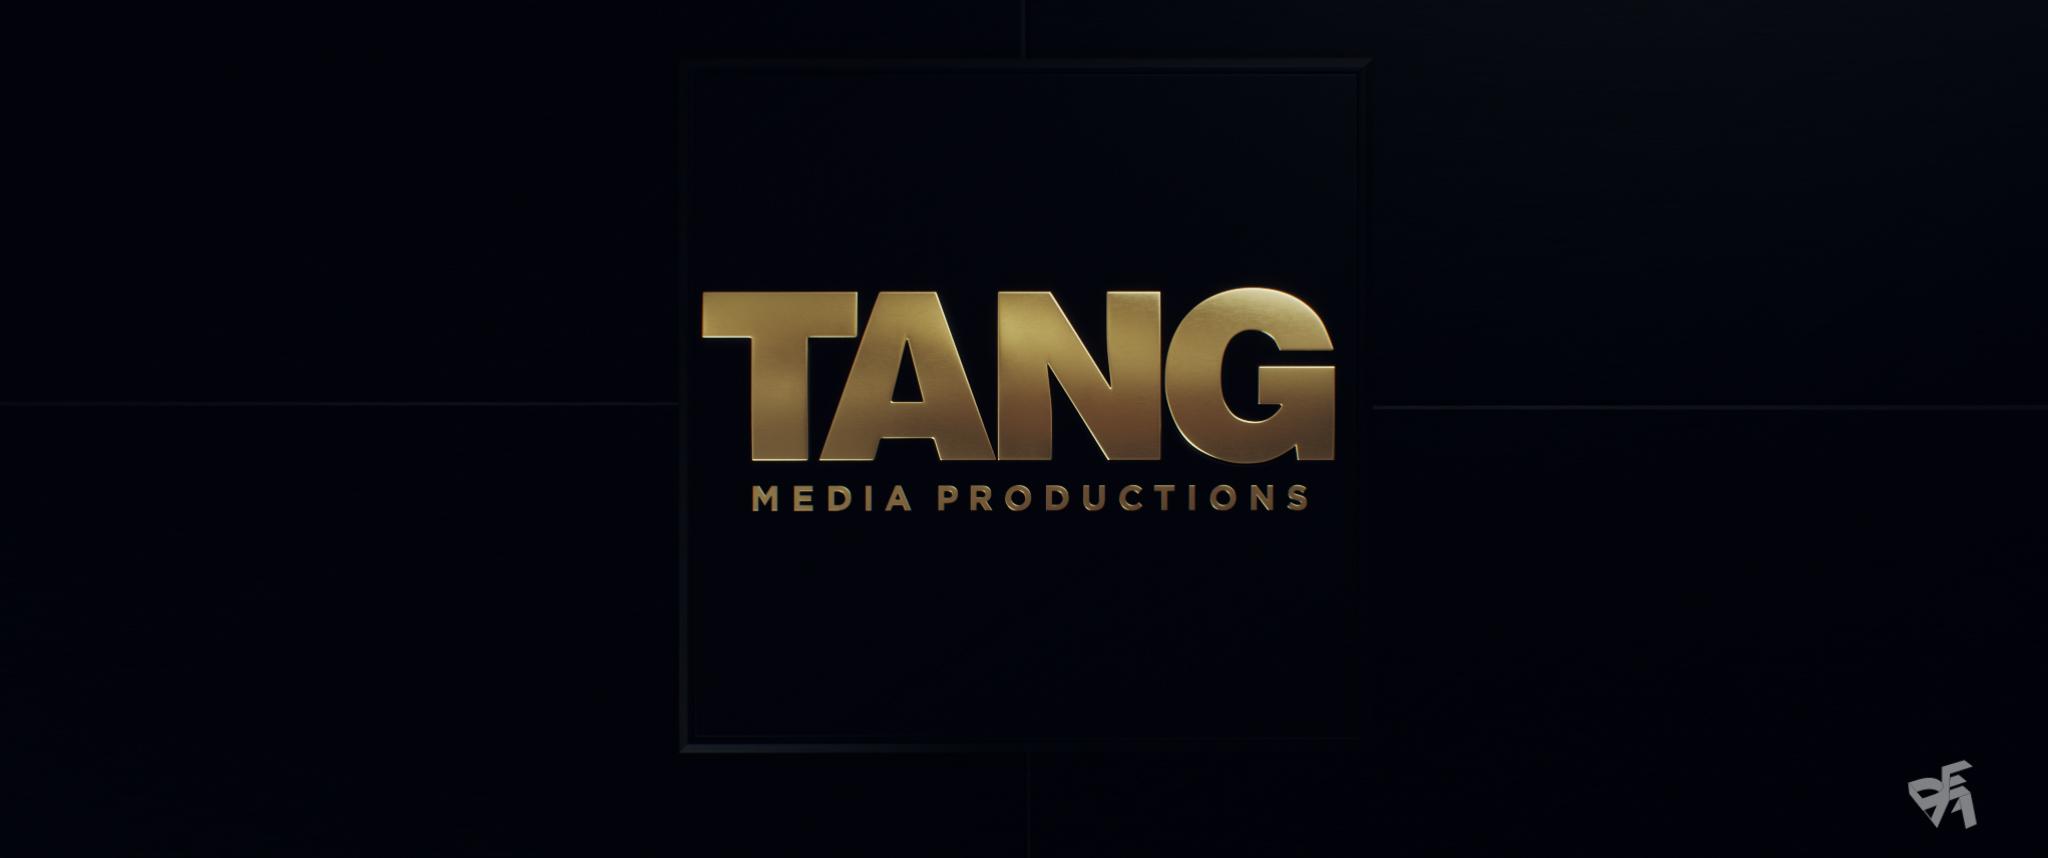 Tang-STUDIOLOGO_05.jpg